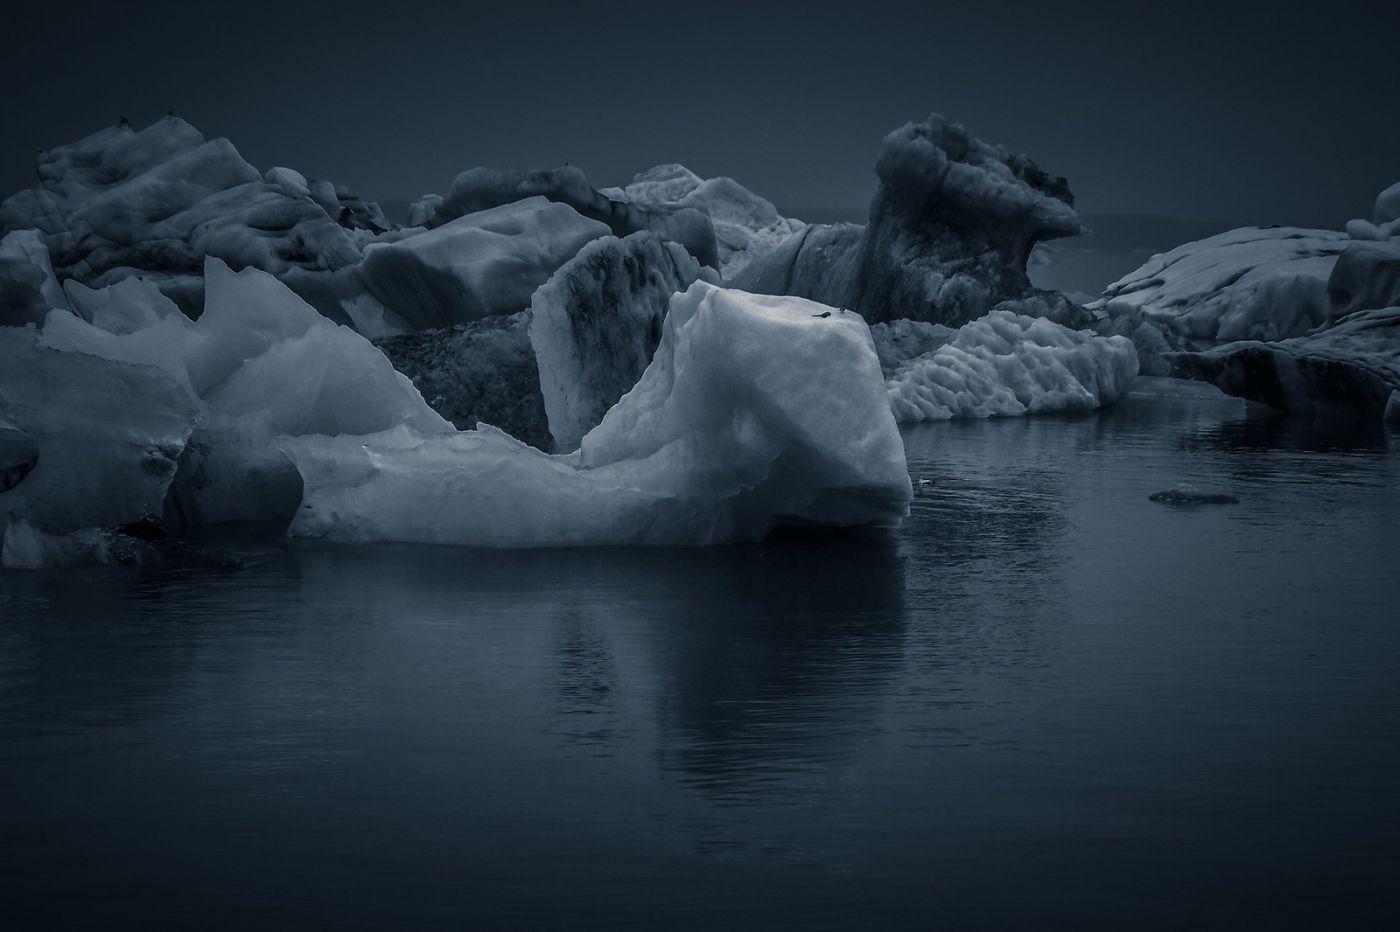 冰岛冰川泻湖(Glacier Lagoon),流动的冰川_图1-8